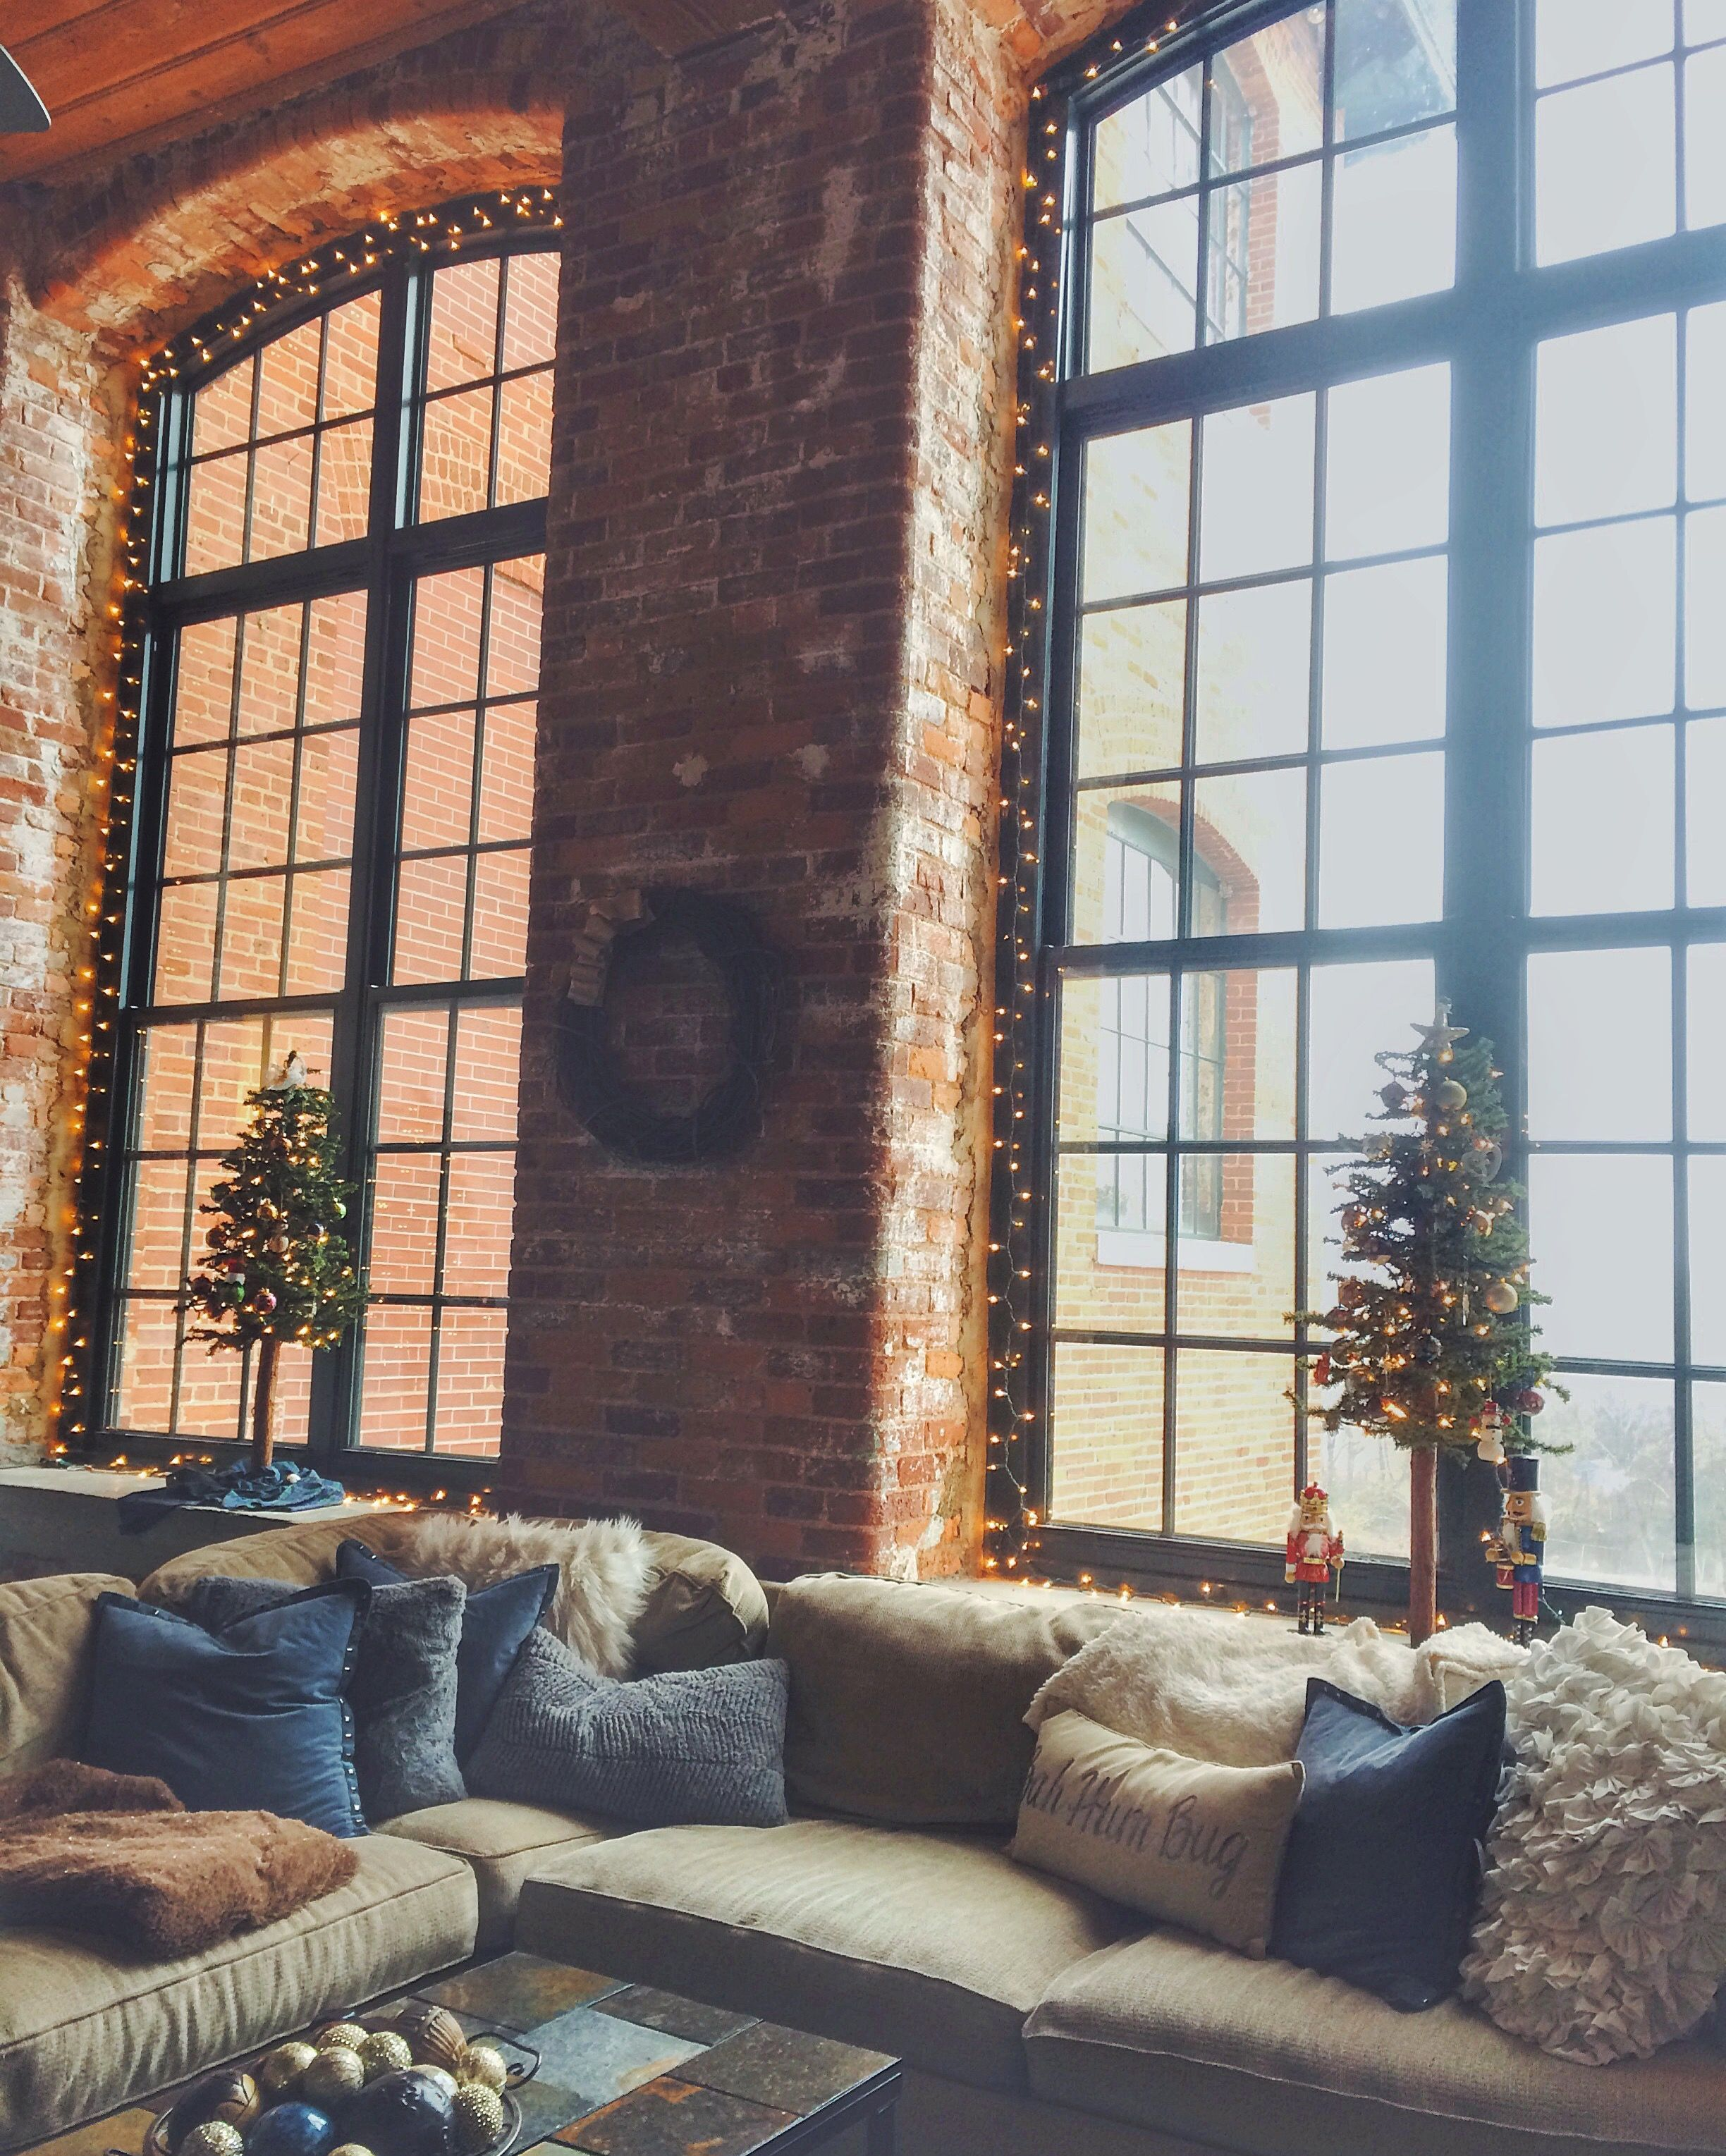 Cheap Loft Apartments: Christmas Decor. Exposed Brick